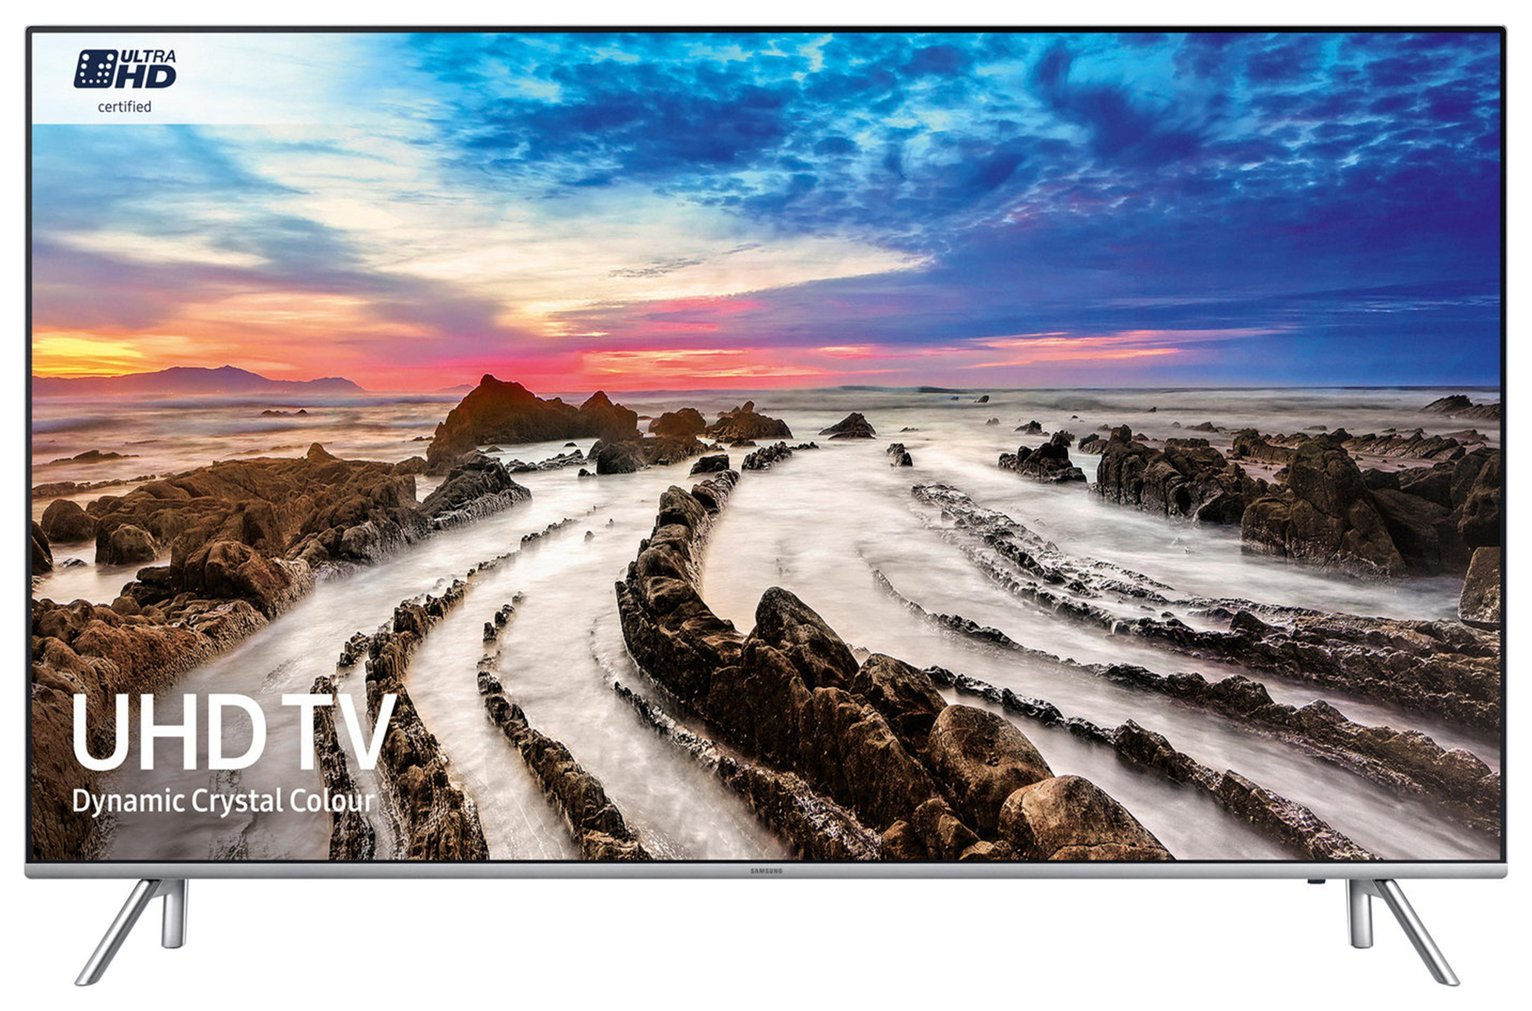 Samsung Samsung 65 Inch 65MU7000 Smart 4K UHD TV with HDR1000